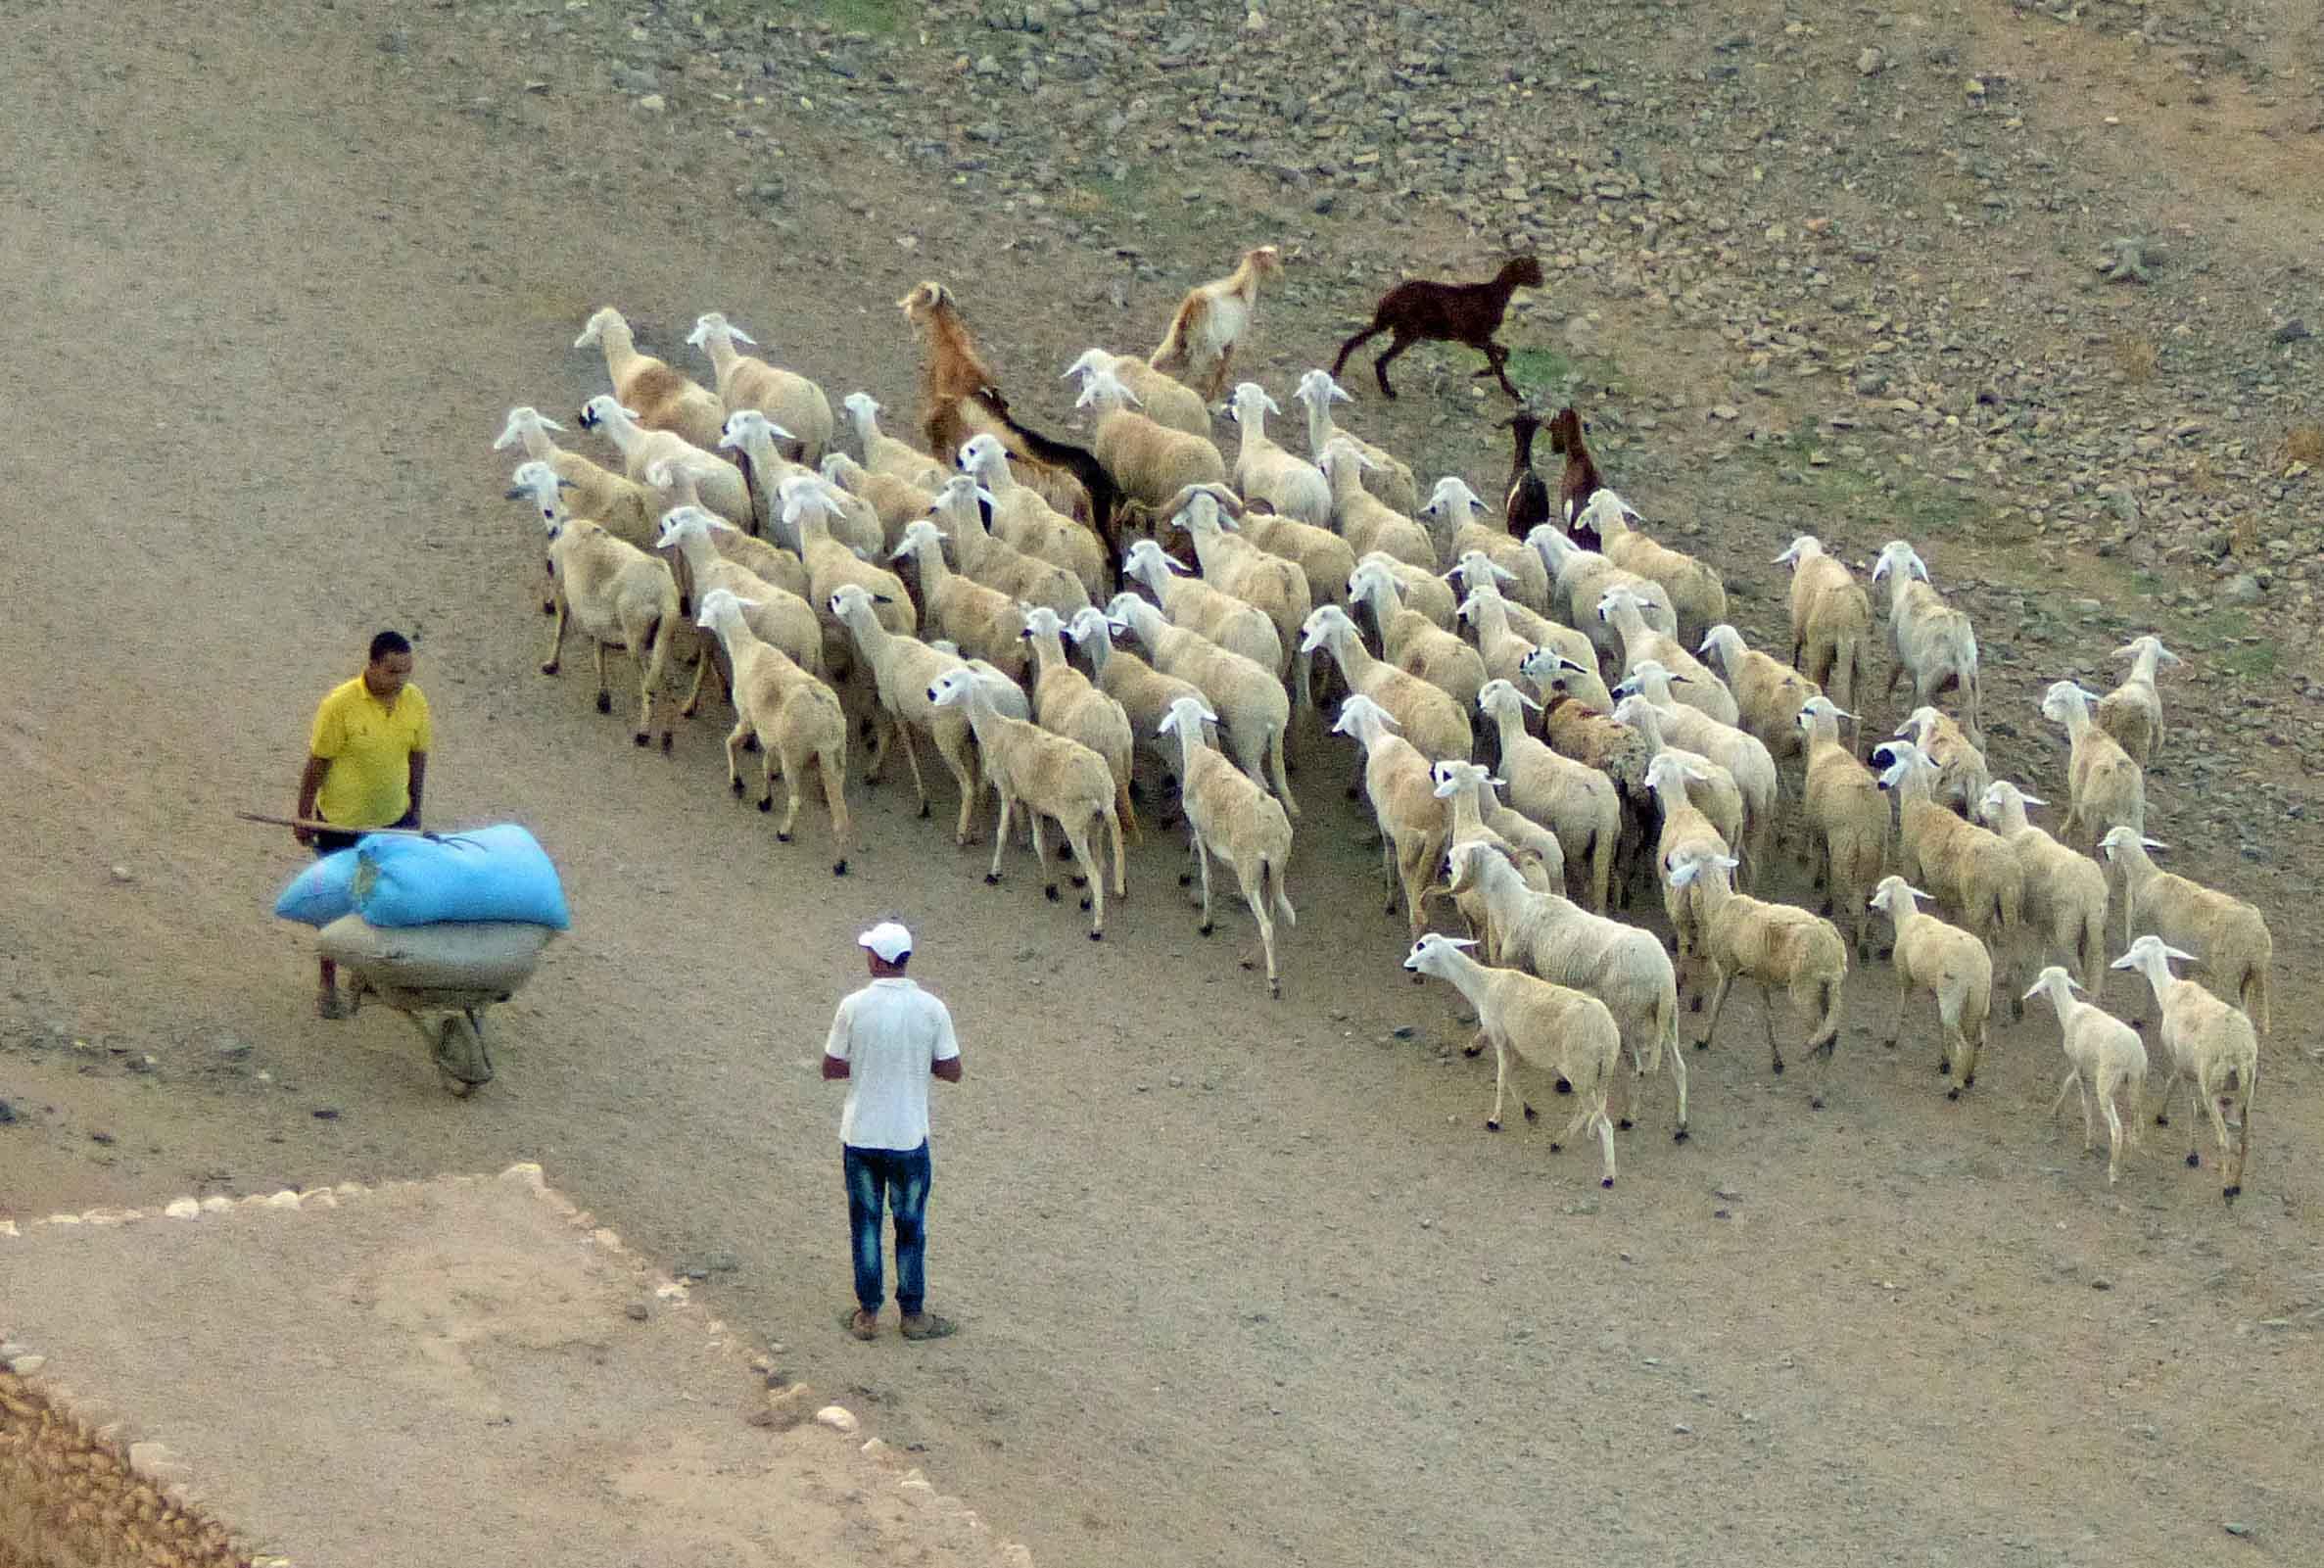 Aerial view of man herding sheep